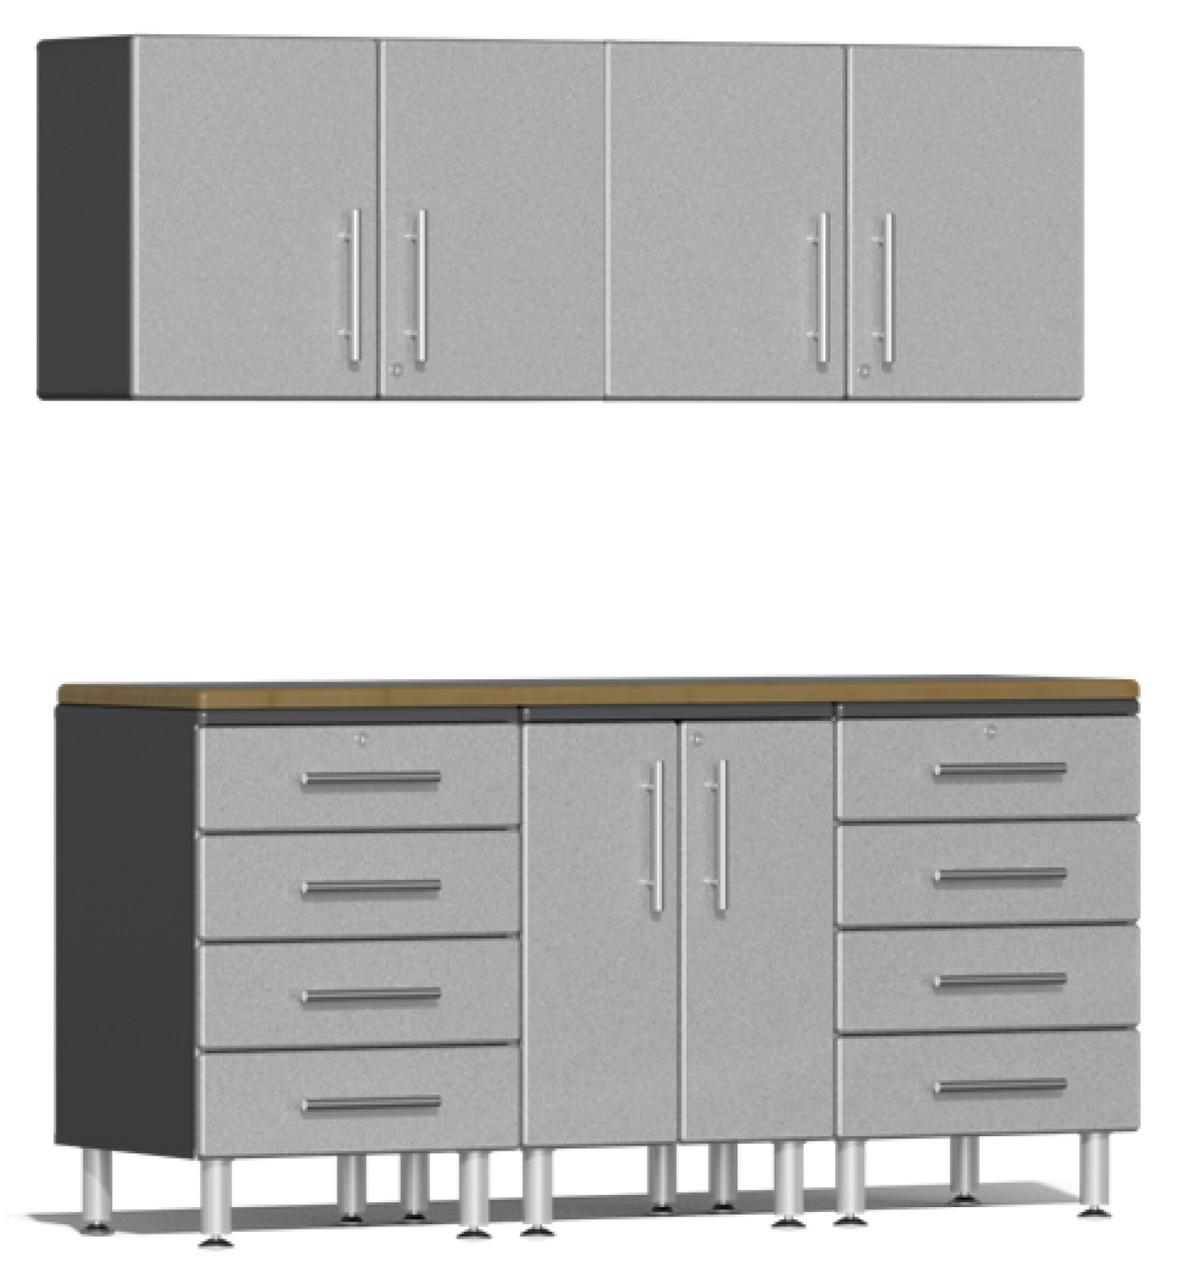 Ulti-MATE Garage 2.0 Series 6' -  6-Piece Workstation Set (UG29062S)